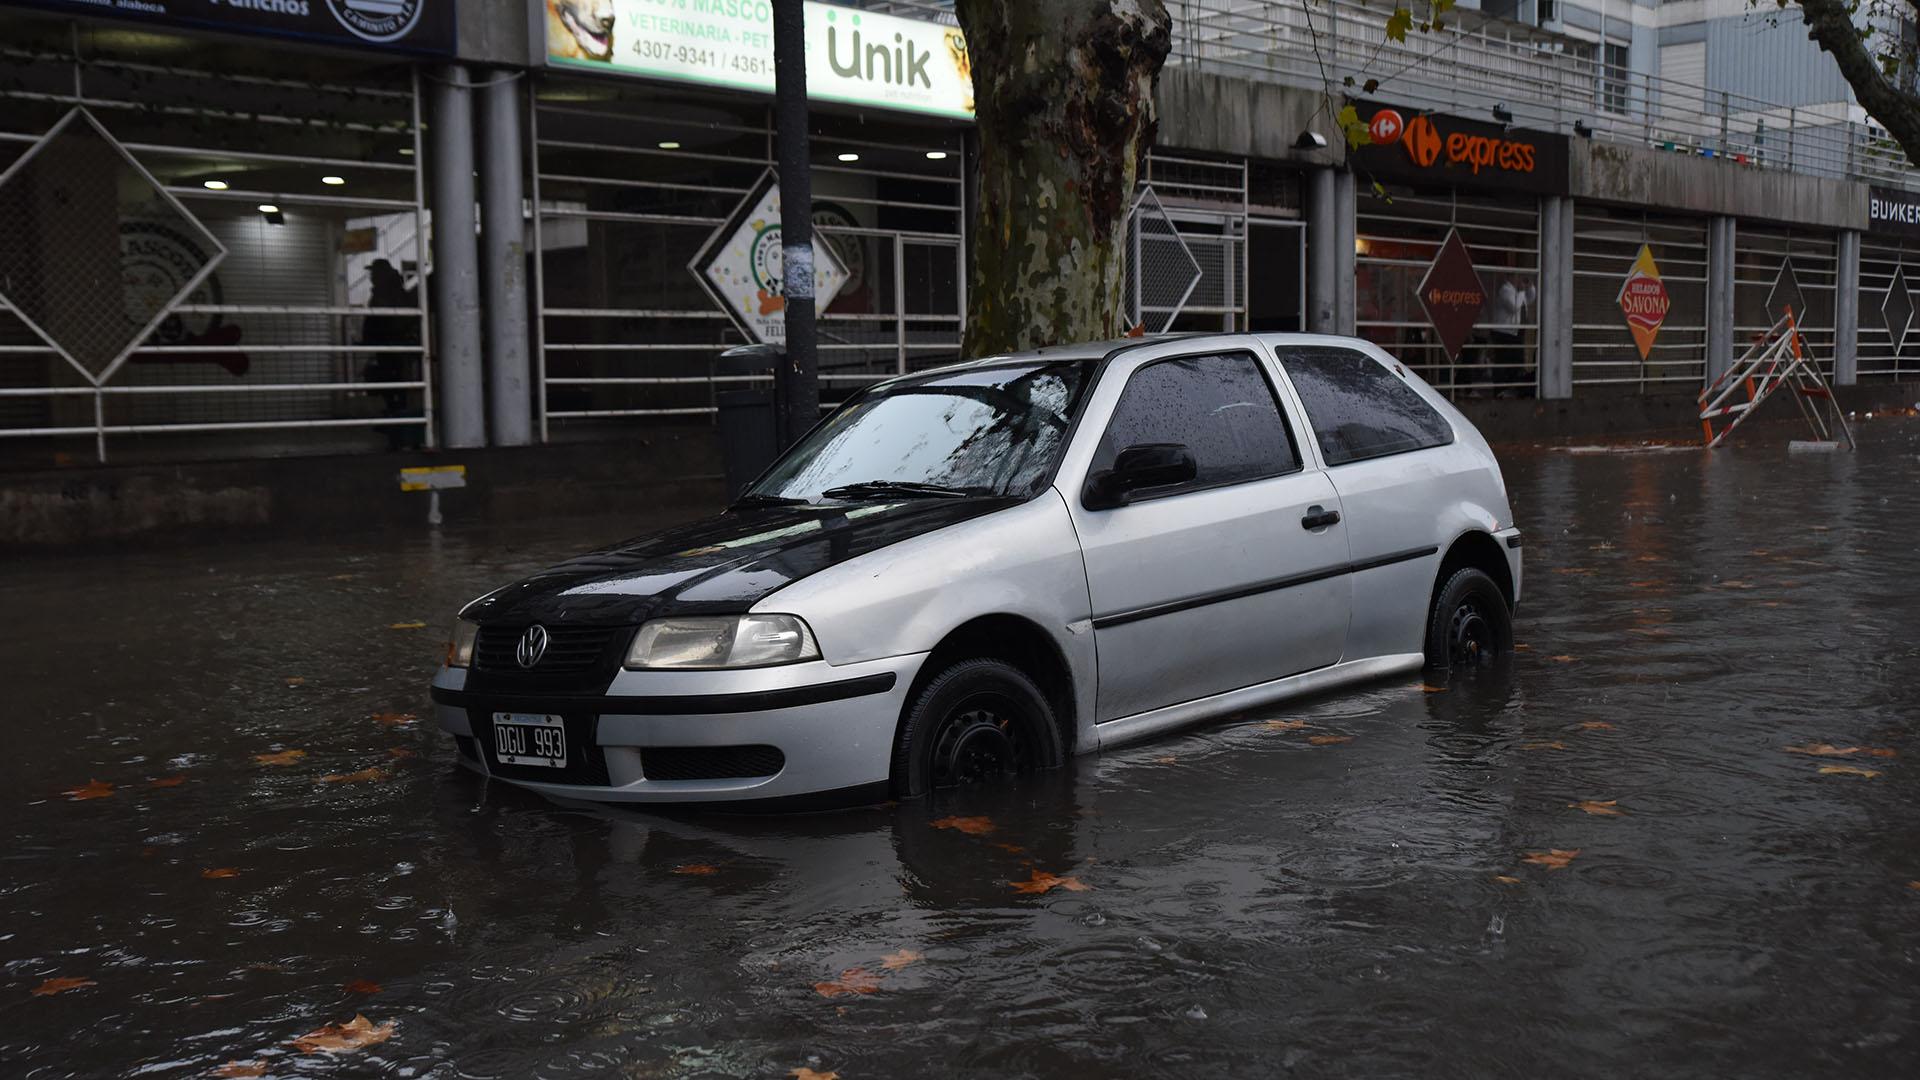 Por las intensas lluvias, en algunos barrios de Capital Federal comenzó a acumularse agua